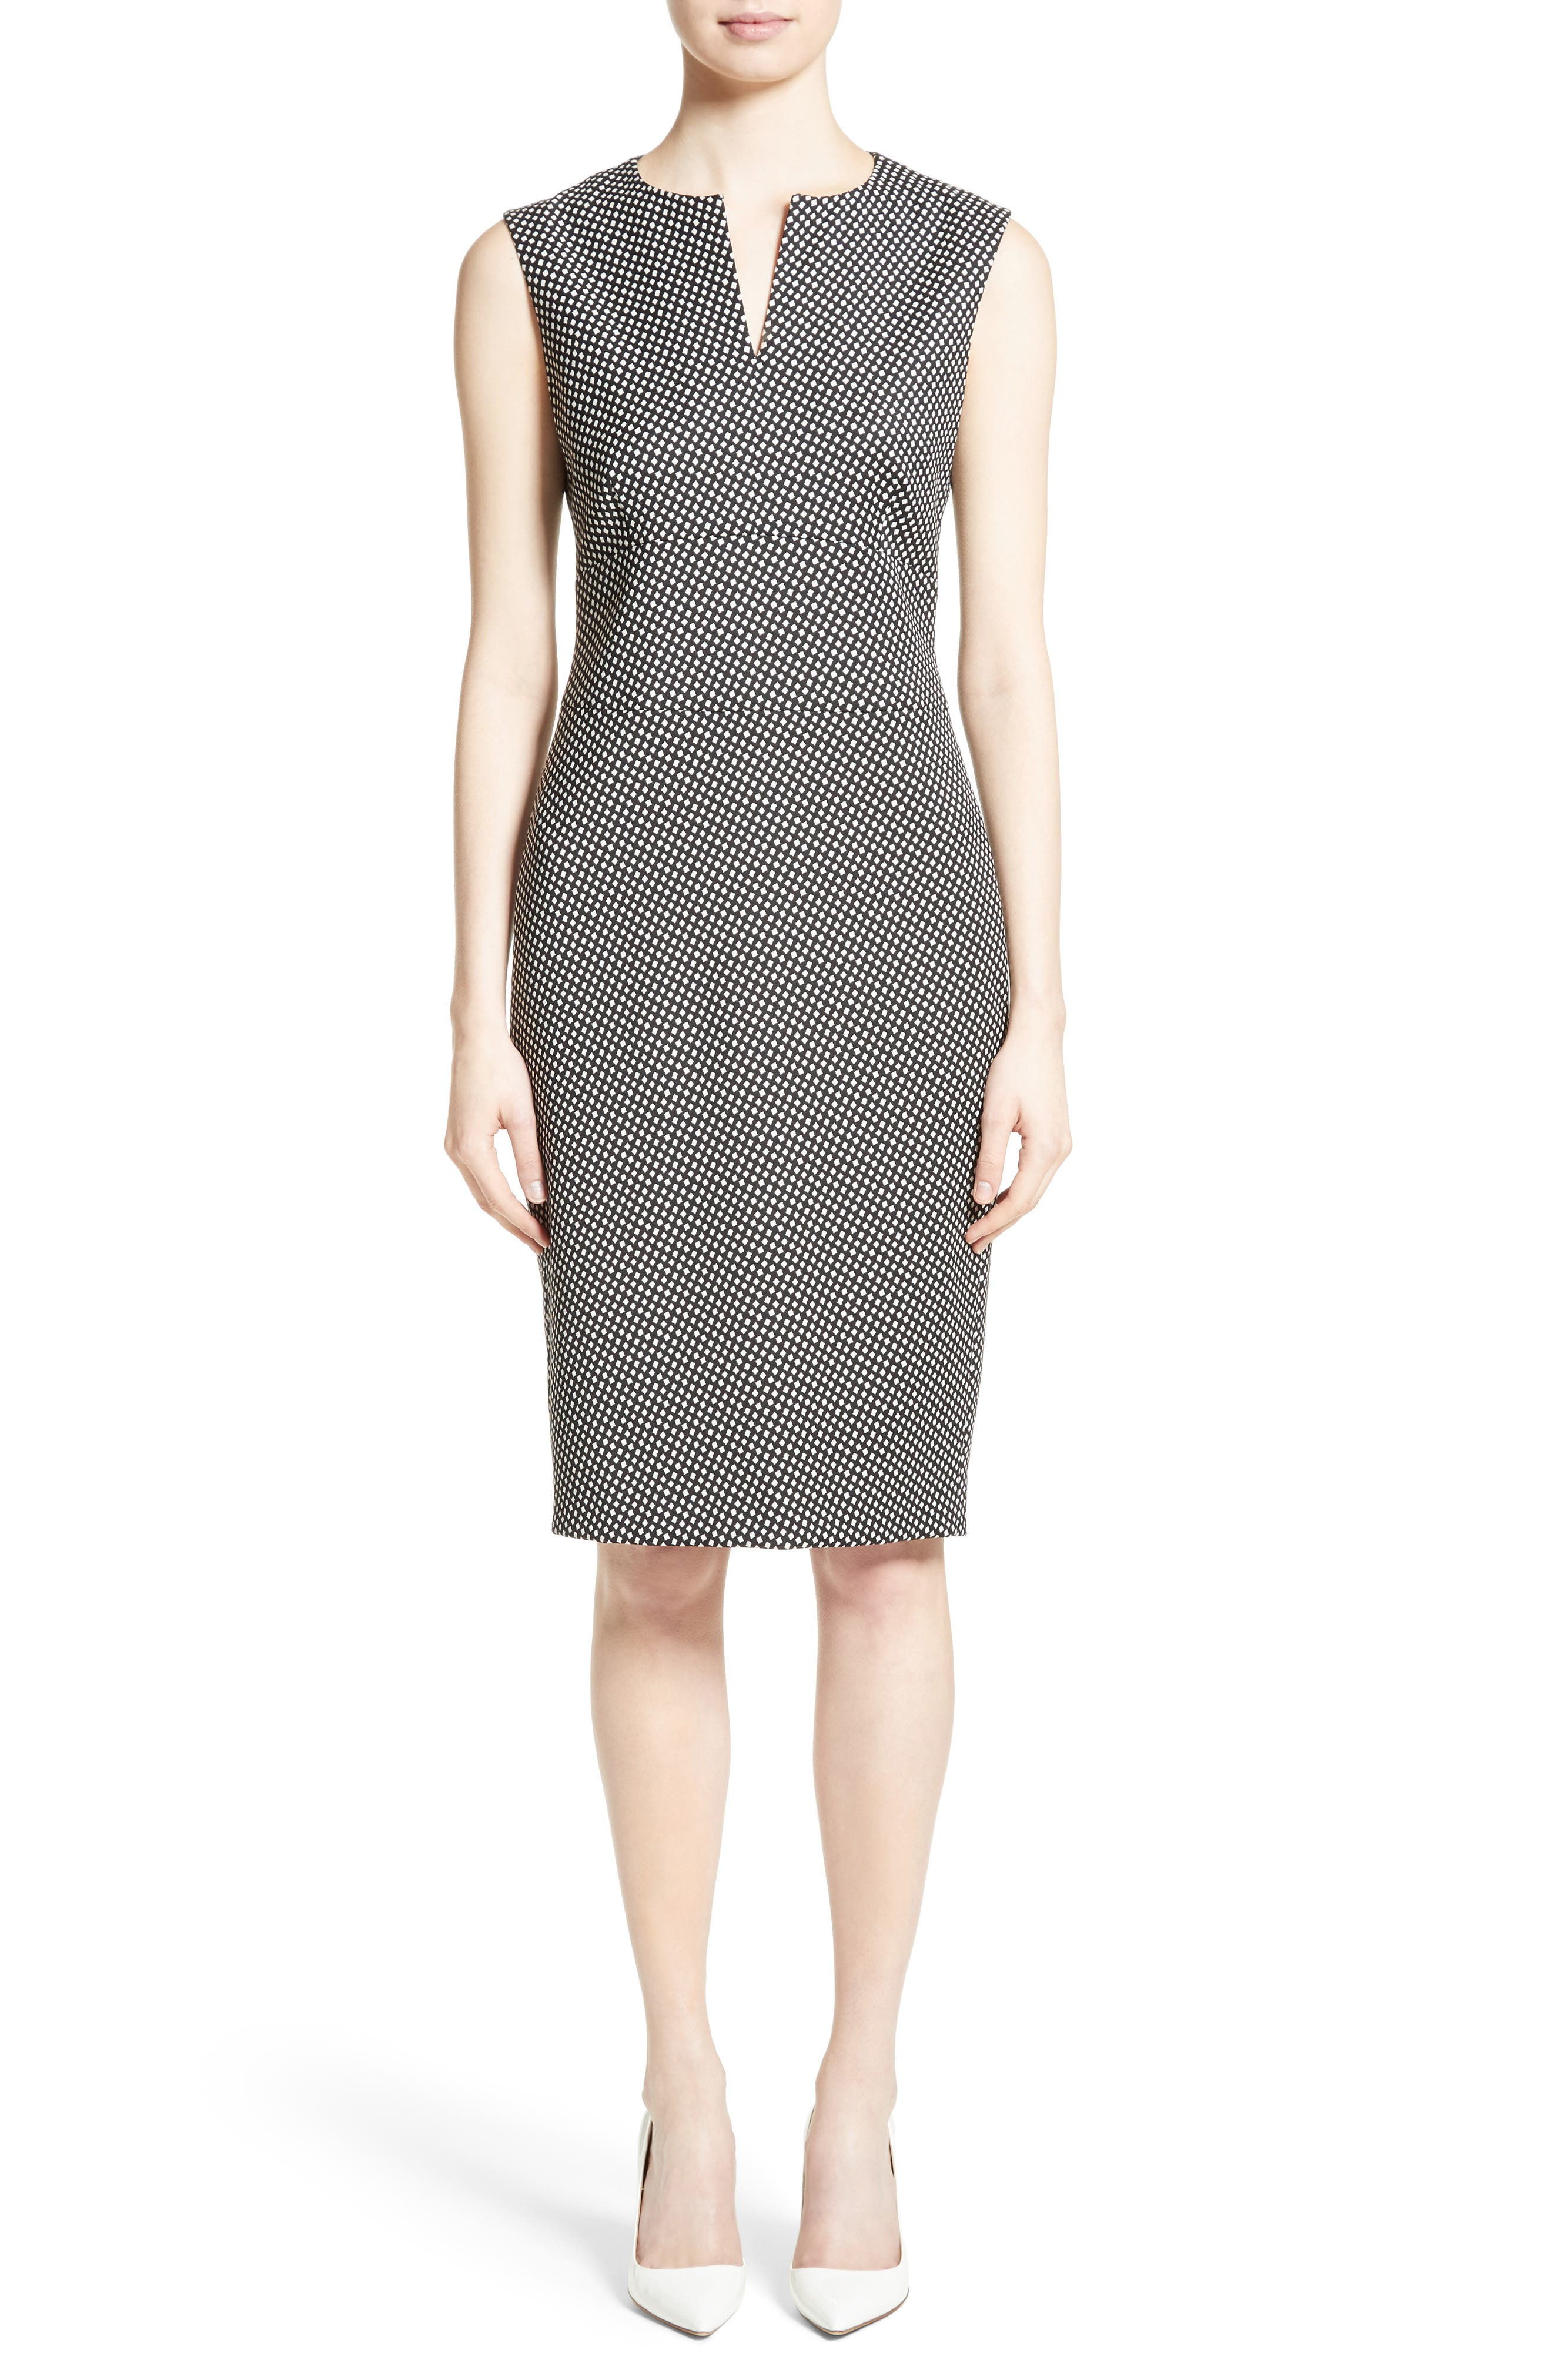 Alternate Image 1 Selected - Max Mara Cerea Sheath Dress